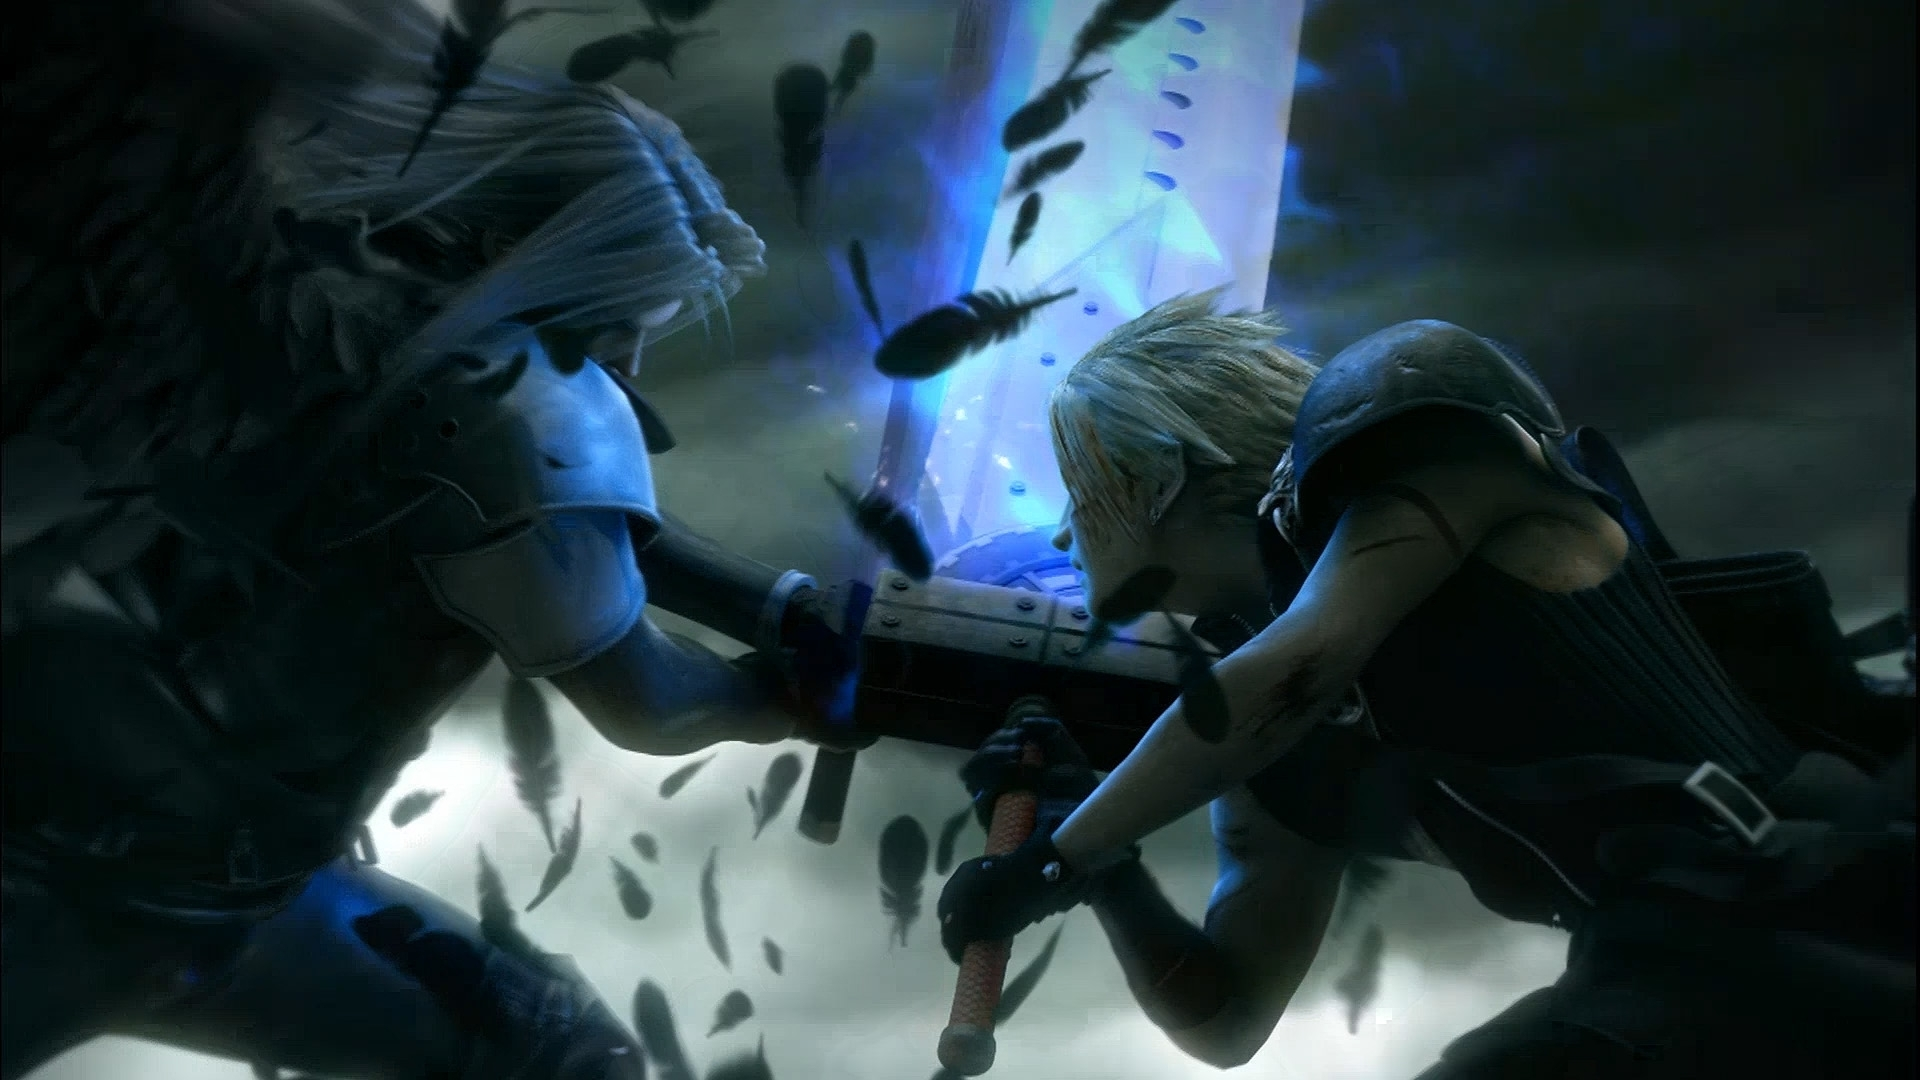 Final Fantasy VII Advent Children Sephiroth vs Cloud Strife